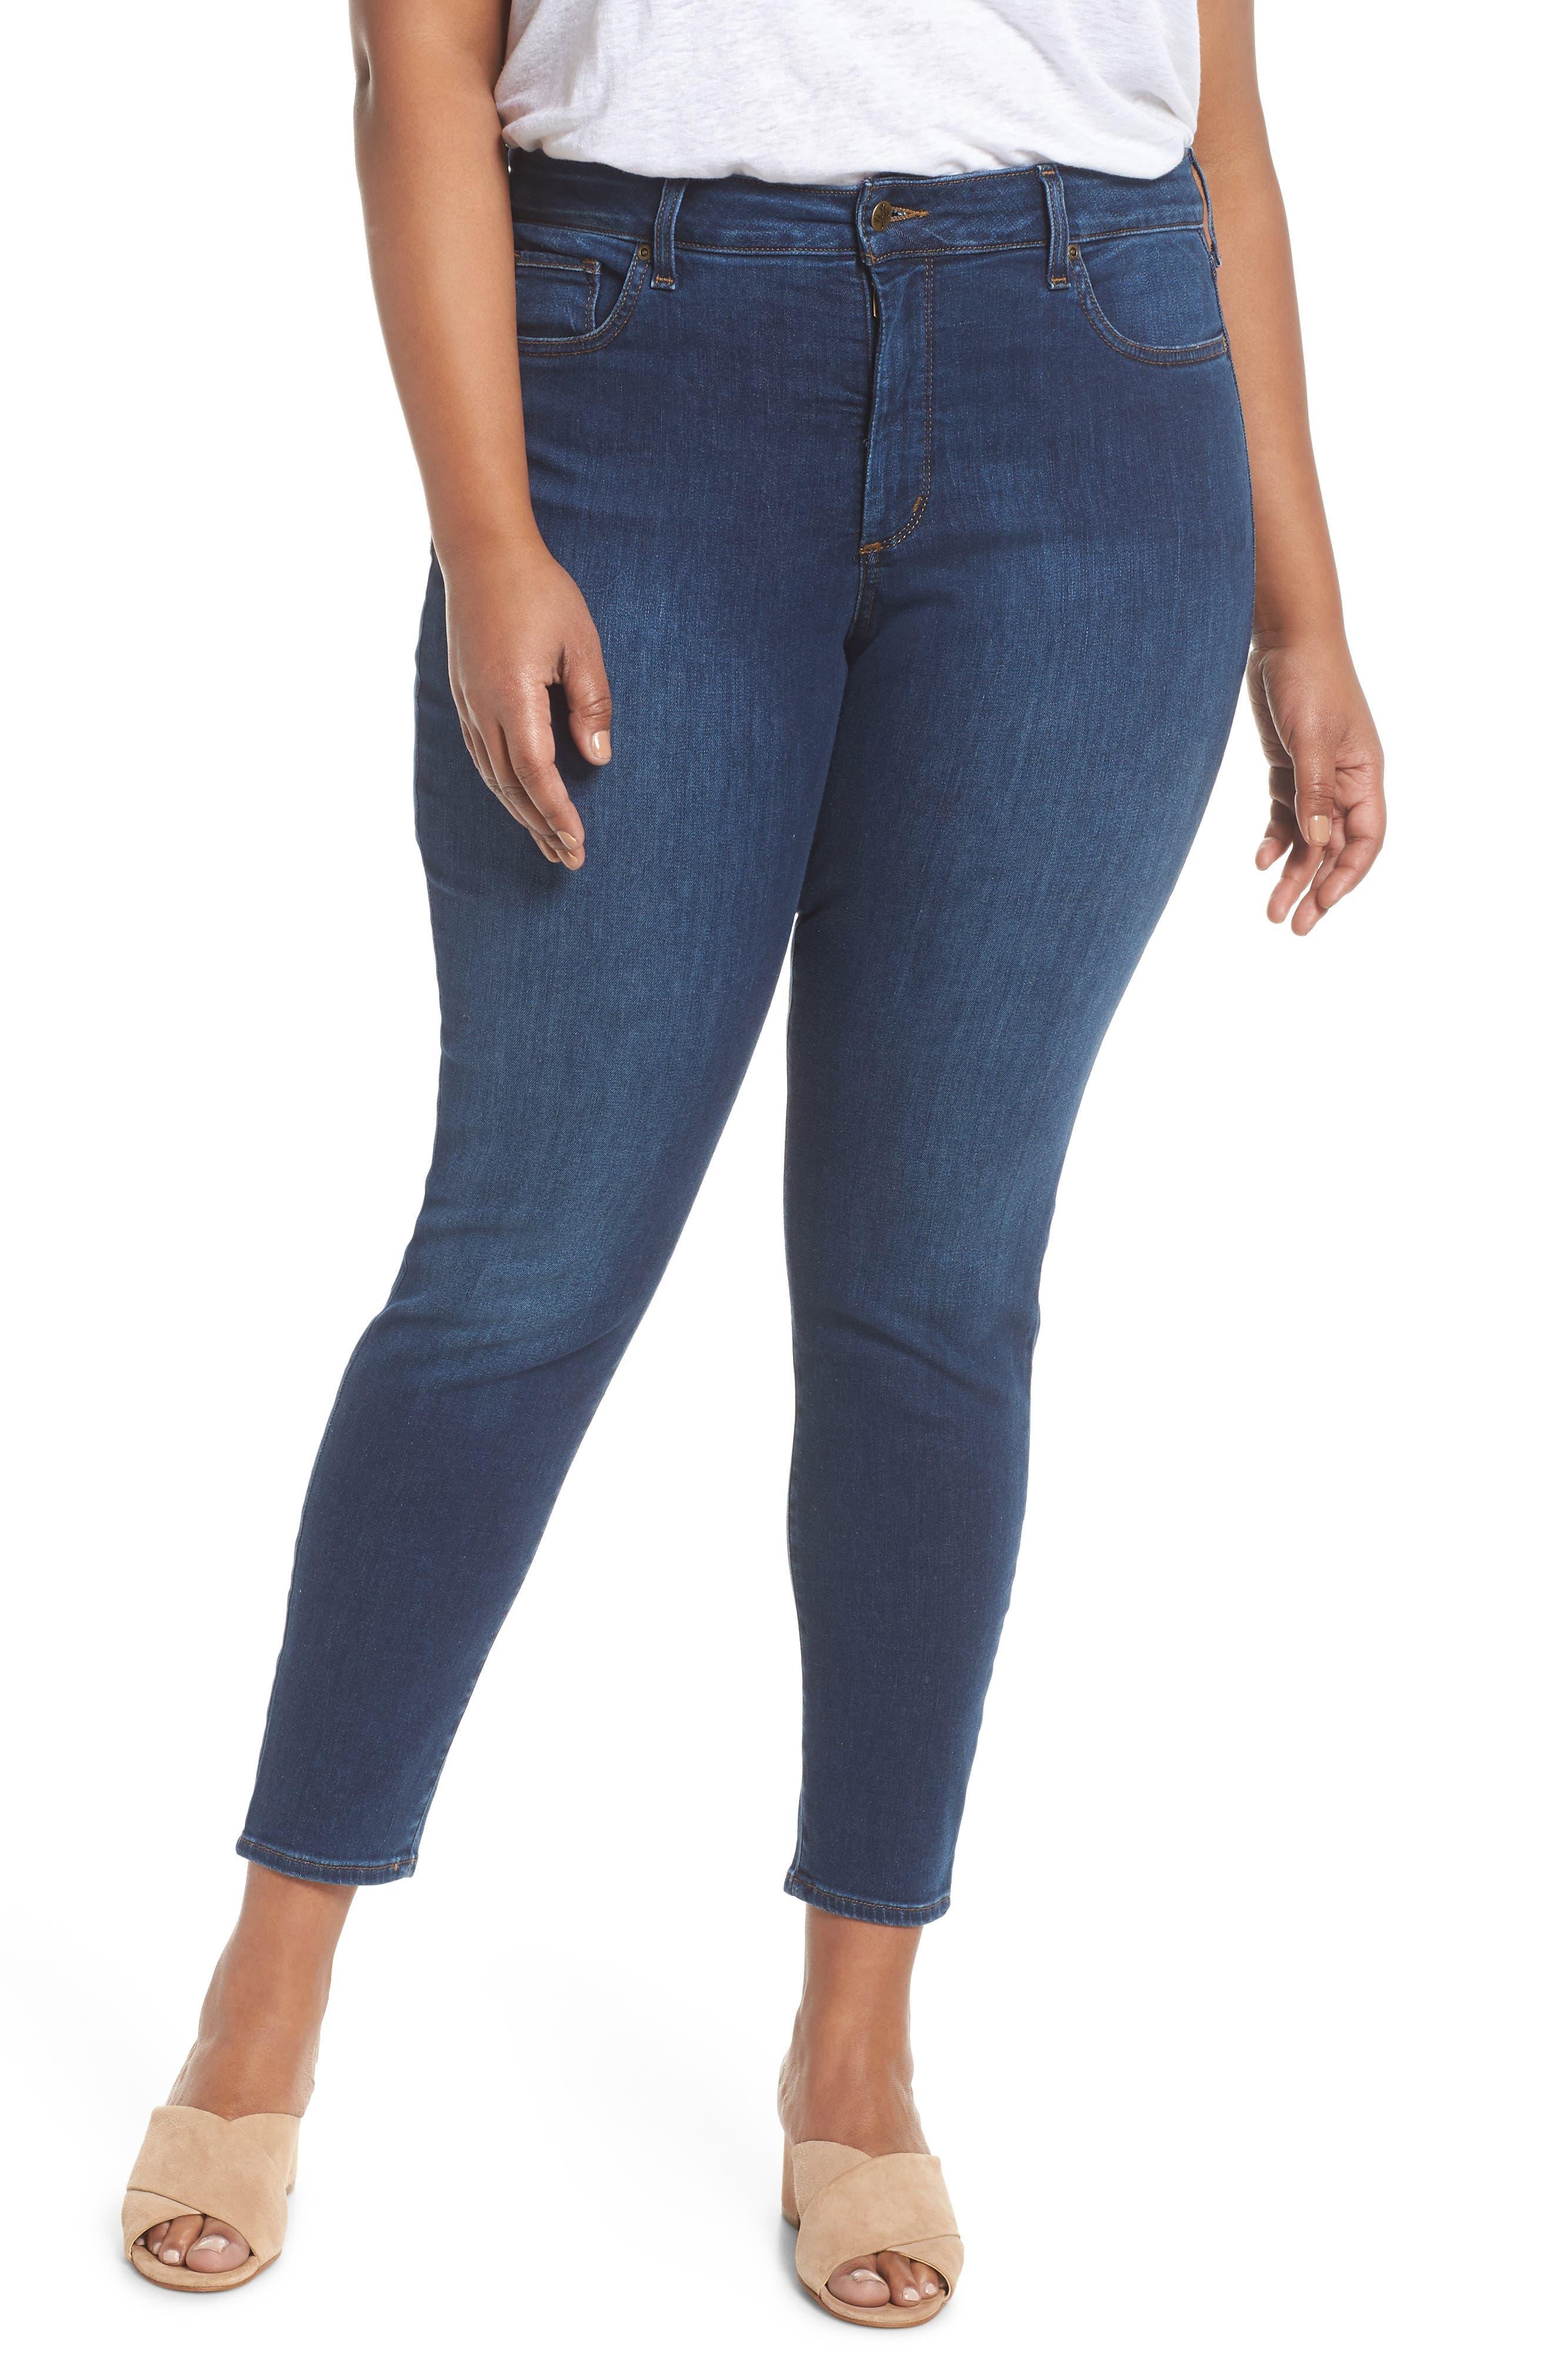 NYDJ Ami Stretch Skinny Jeans (Cooper) (Plus Size)